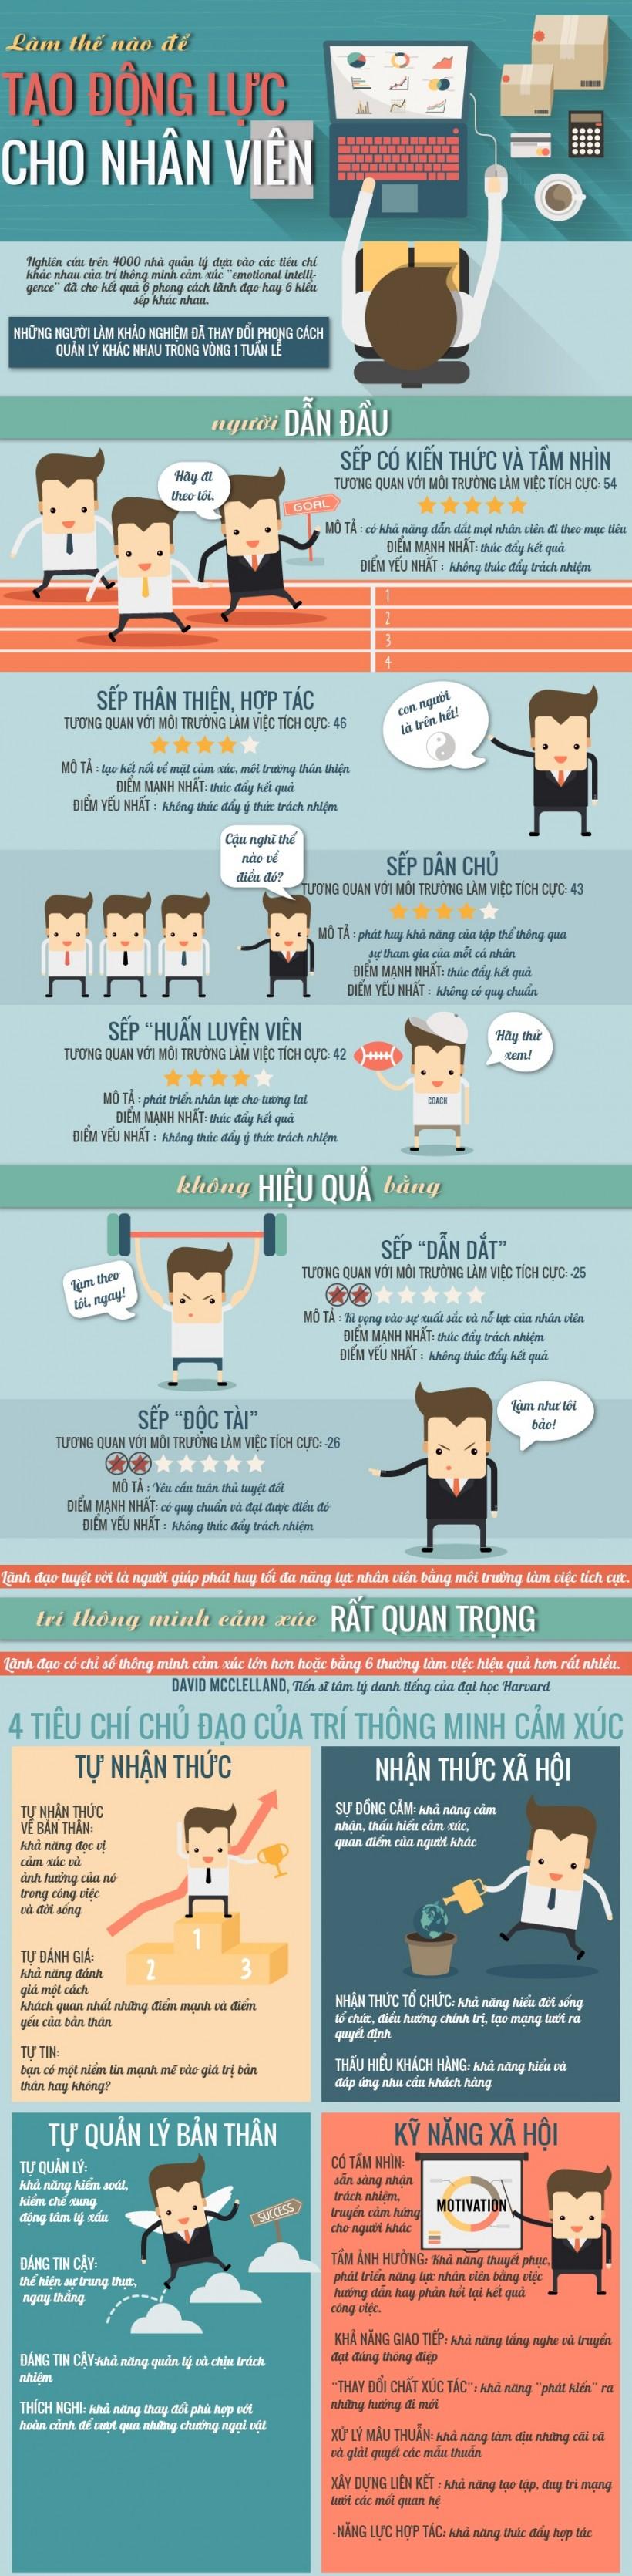 infographic-phng-php-to-ng-lc-cho-nhn-vin-1437038002n4kg8-820x3340